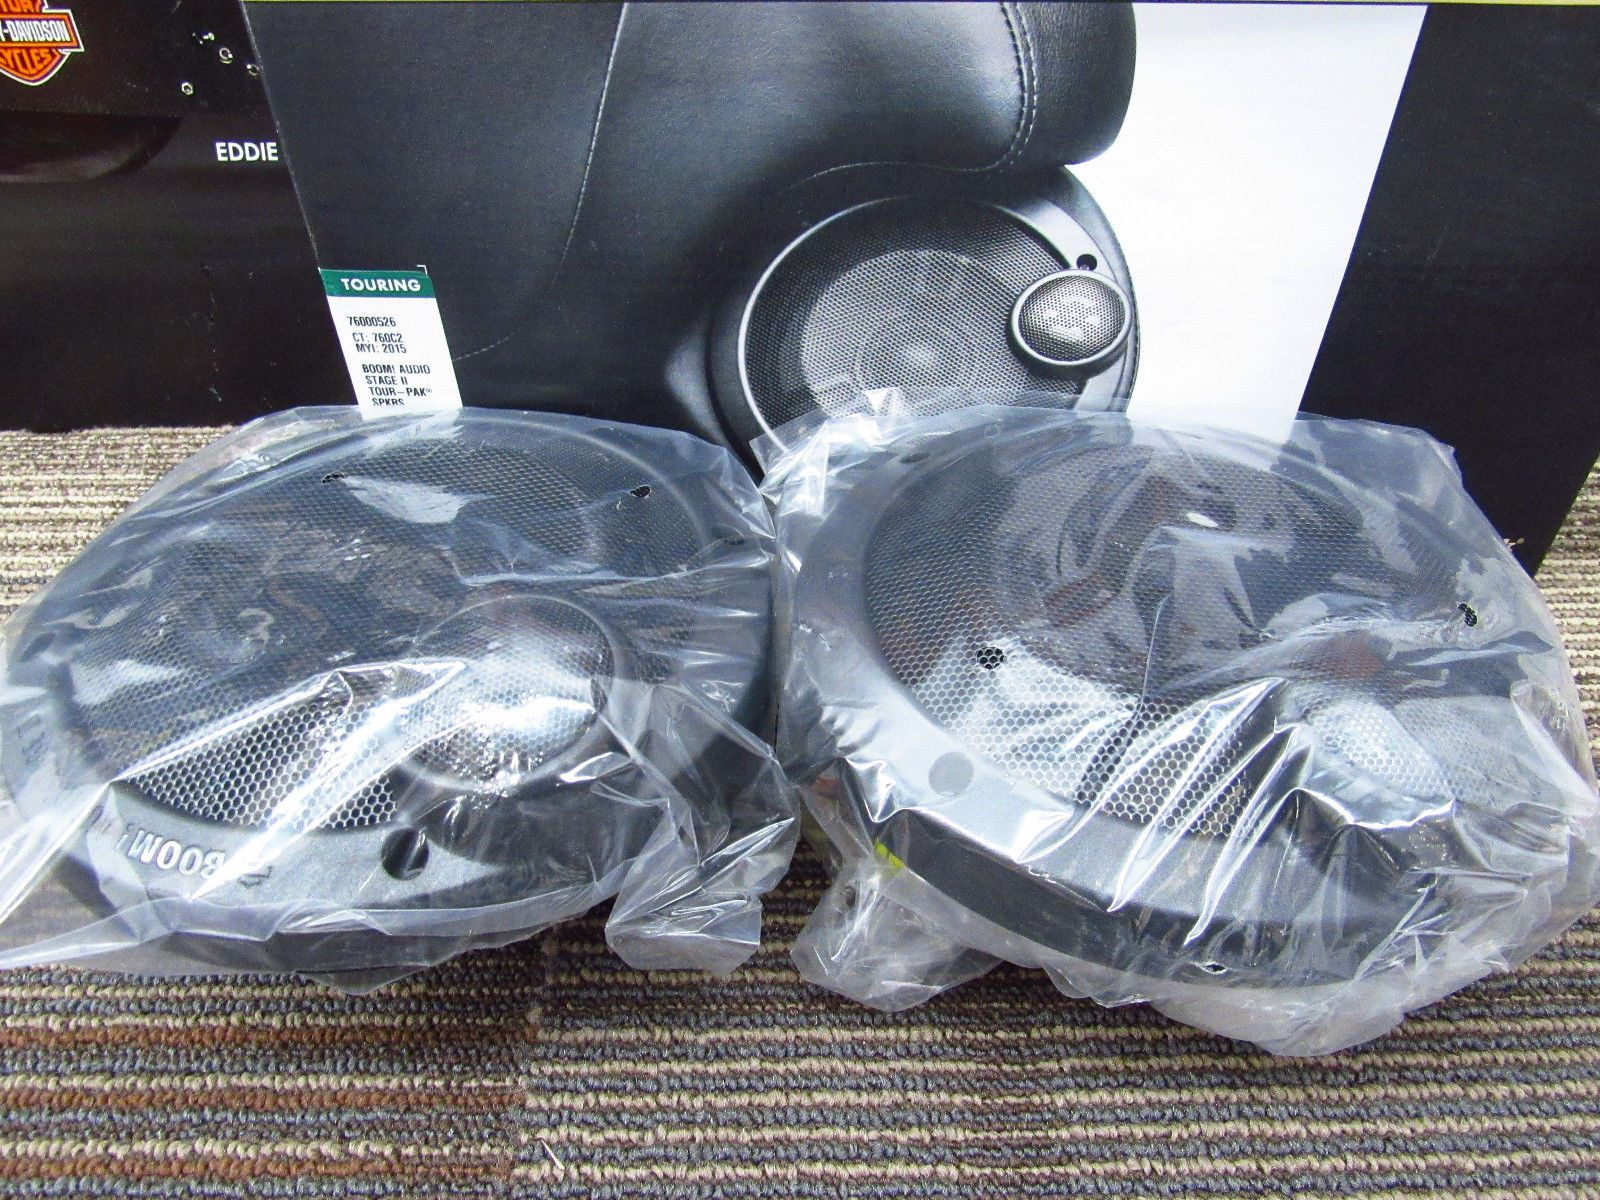 Harley Davidson Boom Audio Stage 2 Speaker Kit For Tour Pak Luggage 76000526 Please